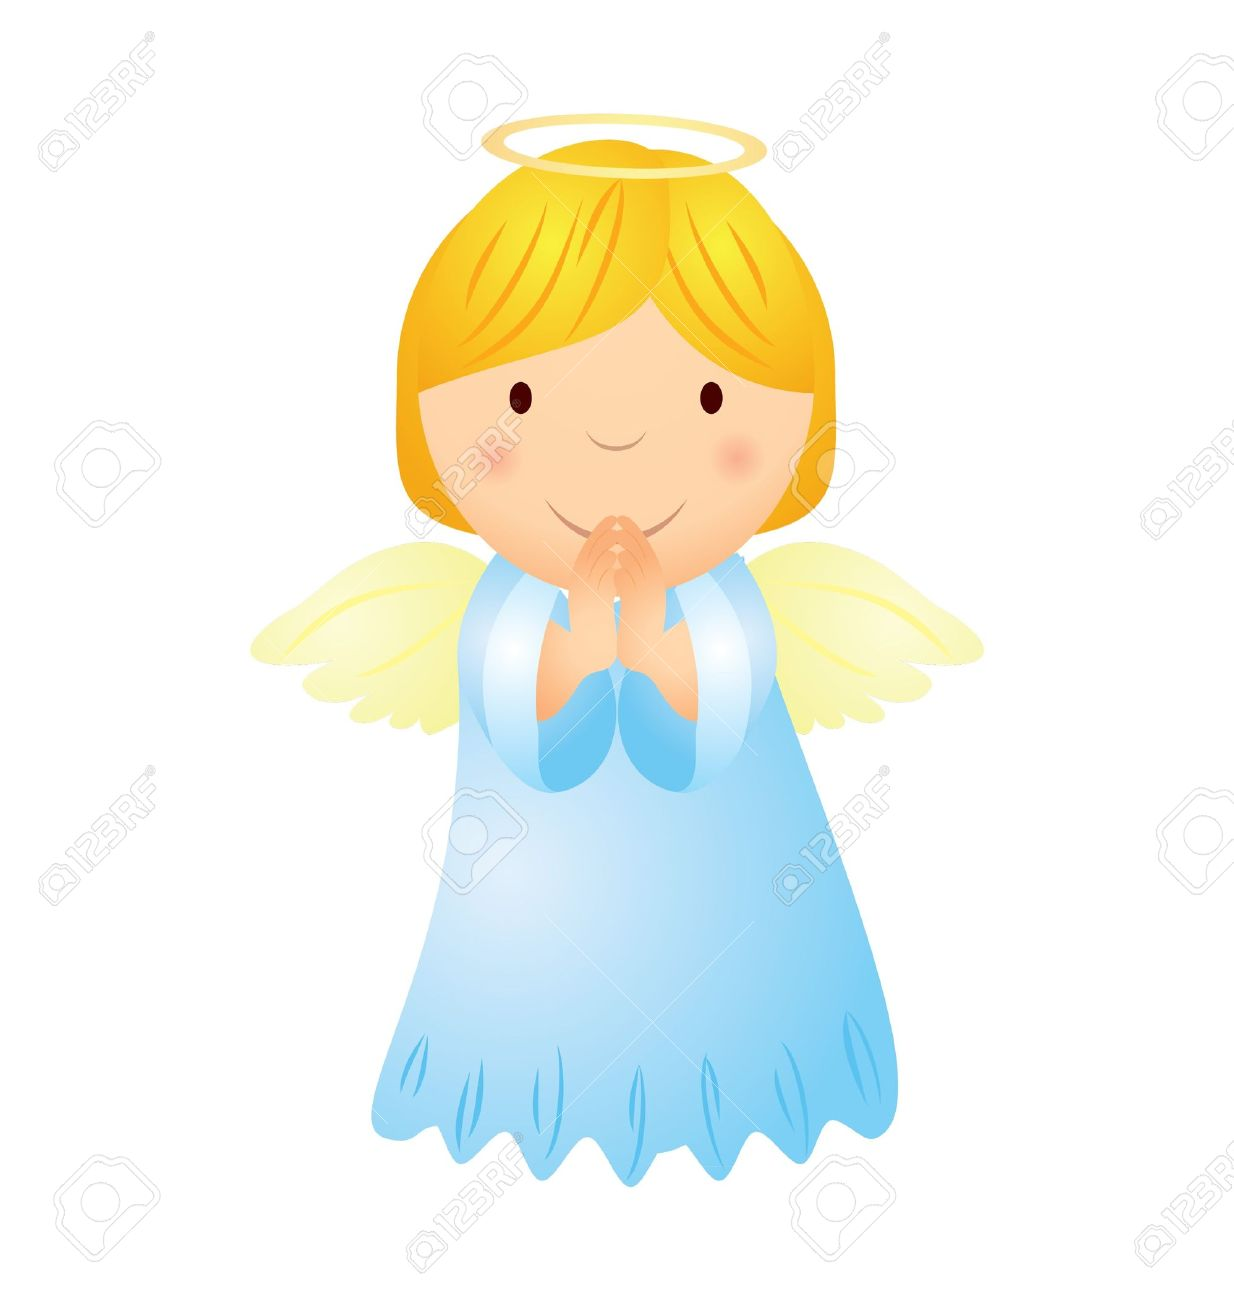 1234x1300 Cartoon Angel Girl With Magic Wand Royalty Free Cliparts, Vectors